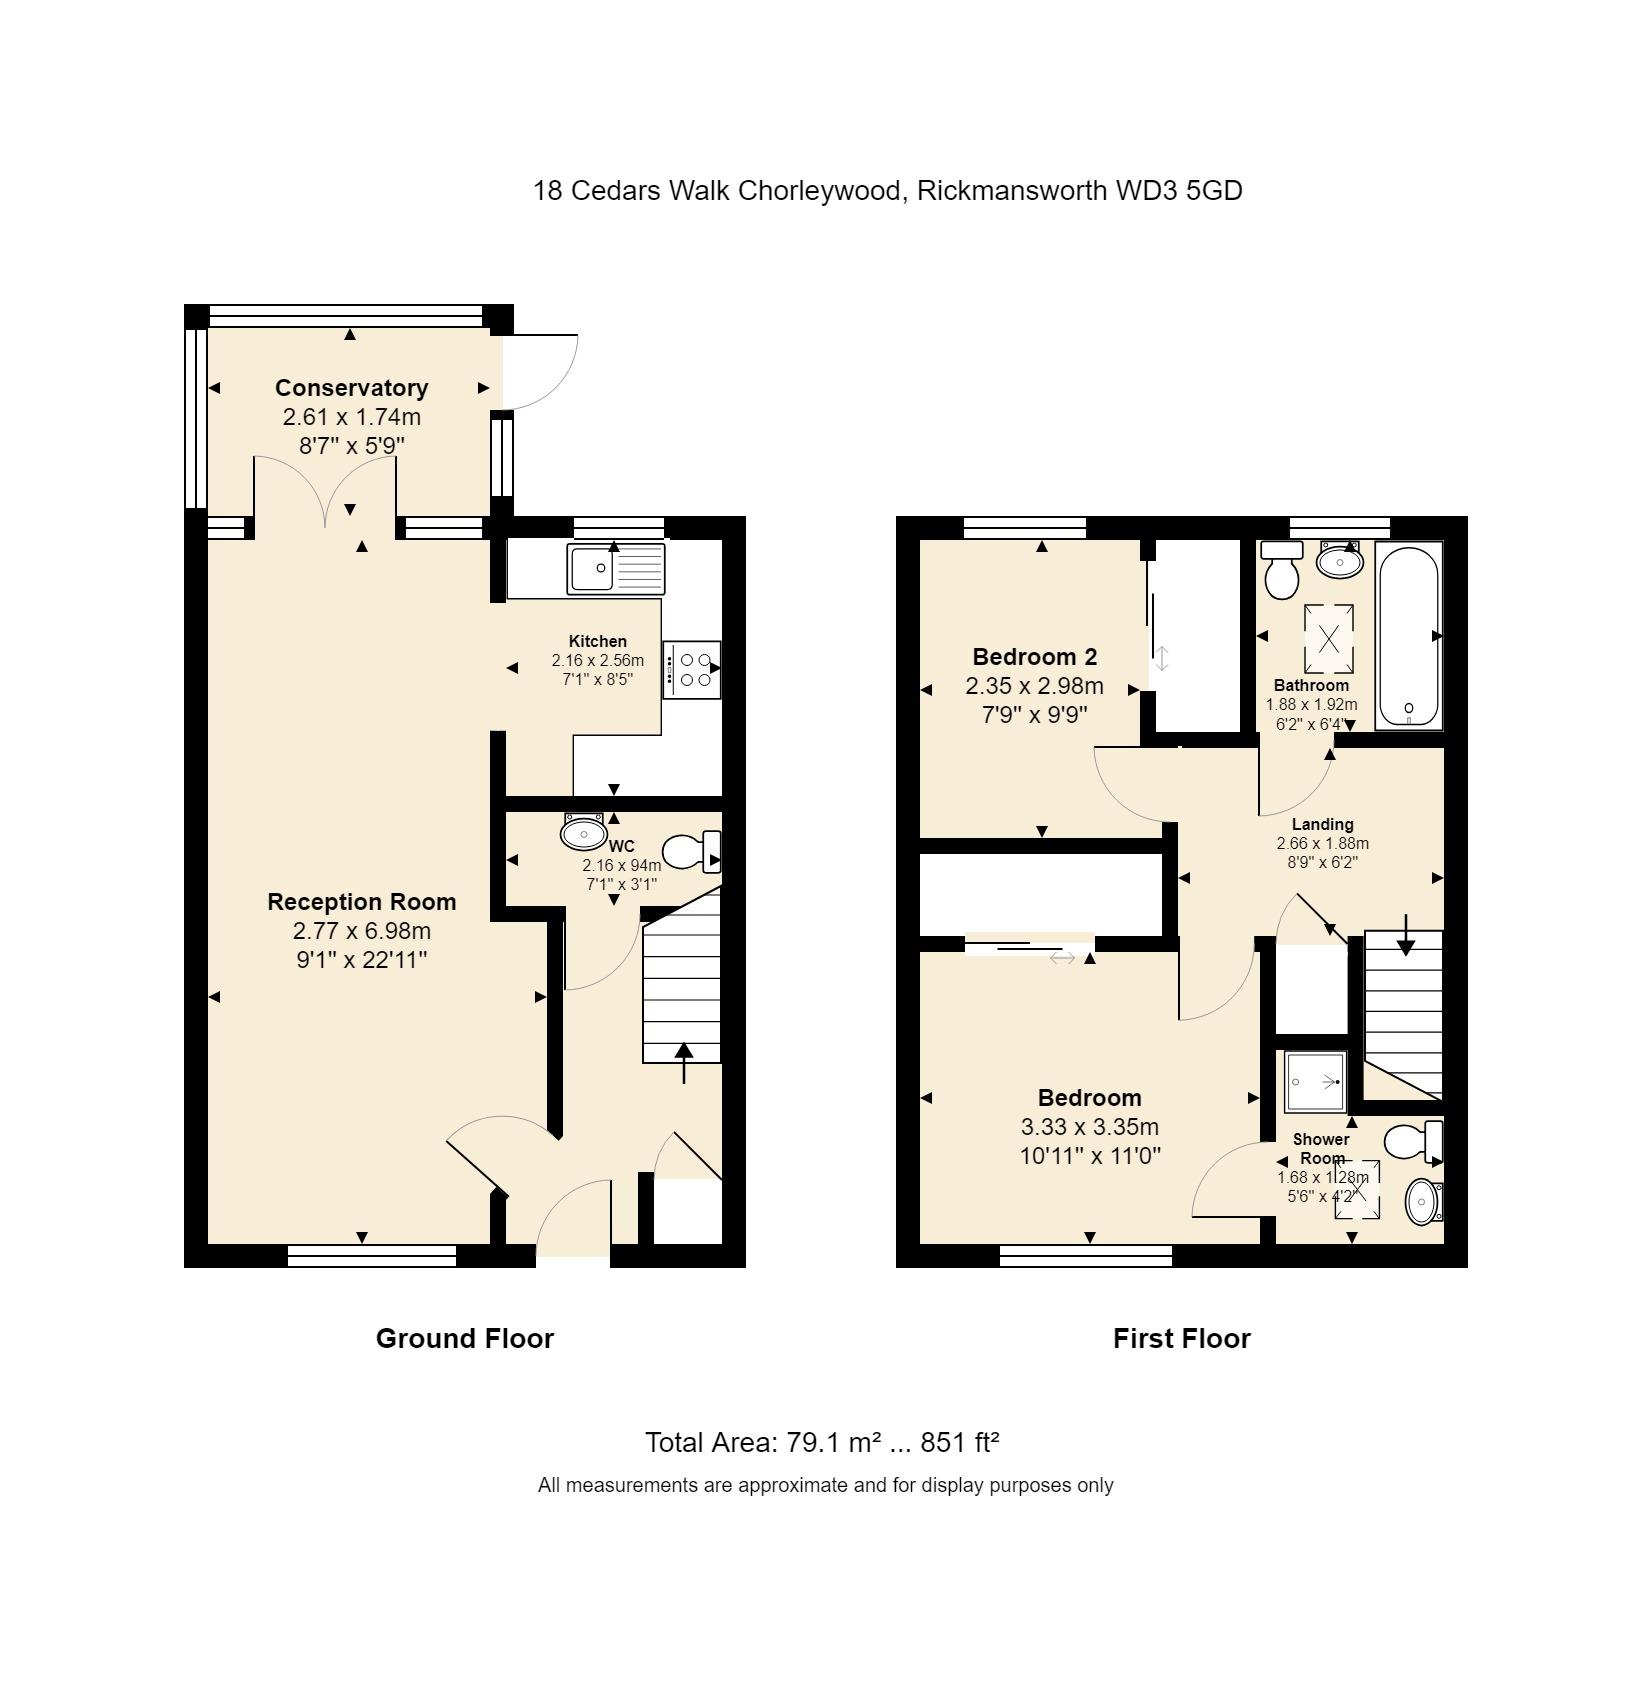 18 Cedars Walk Floorplan